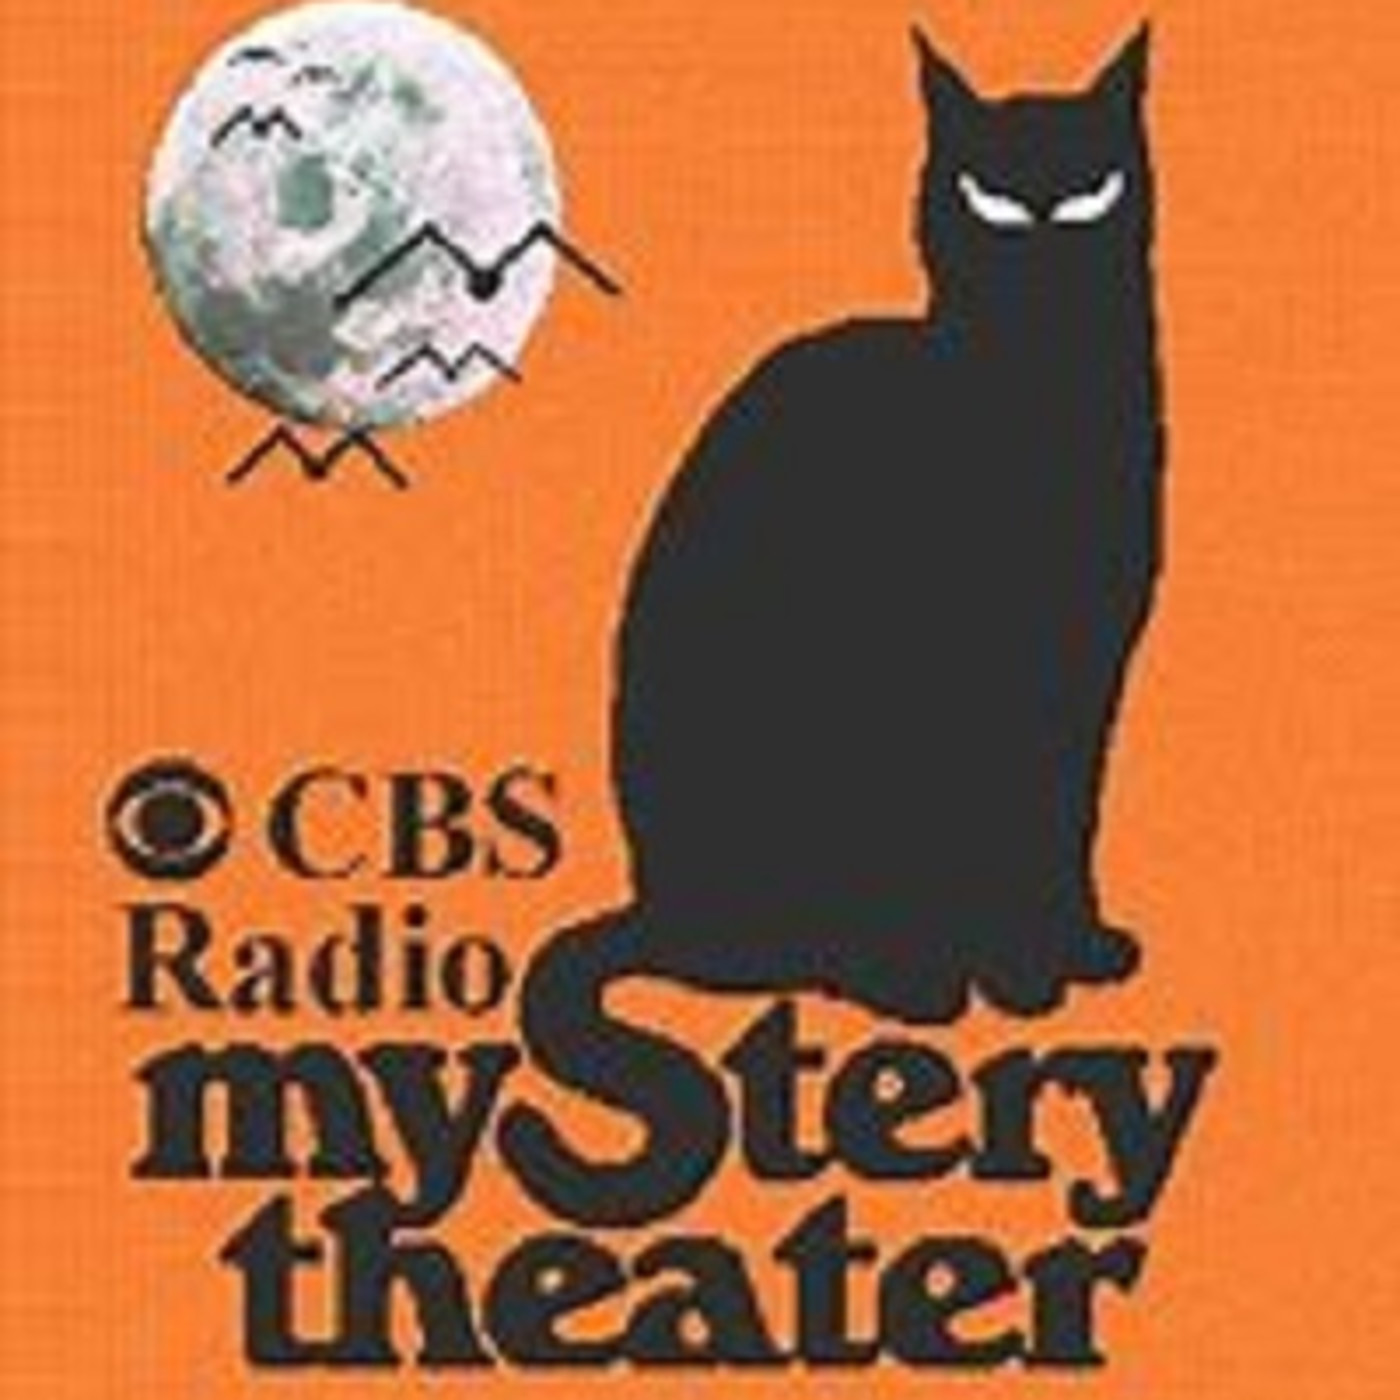 CBS Radio Mystery Theater_79-09-12_(1012)_The Two Sams